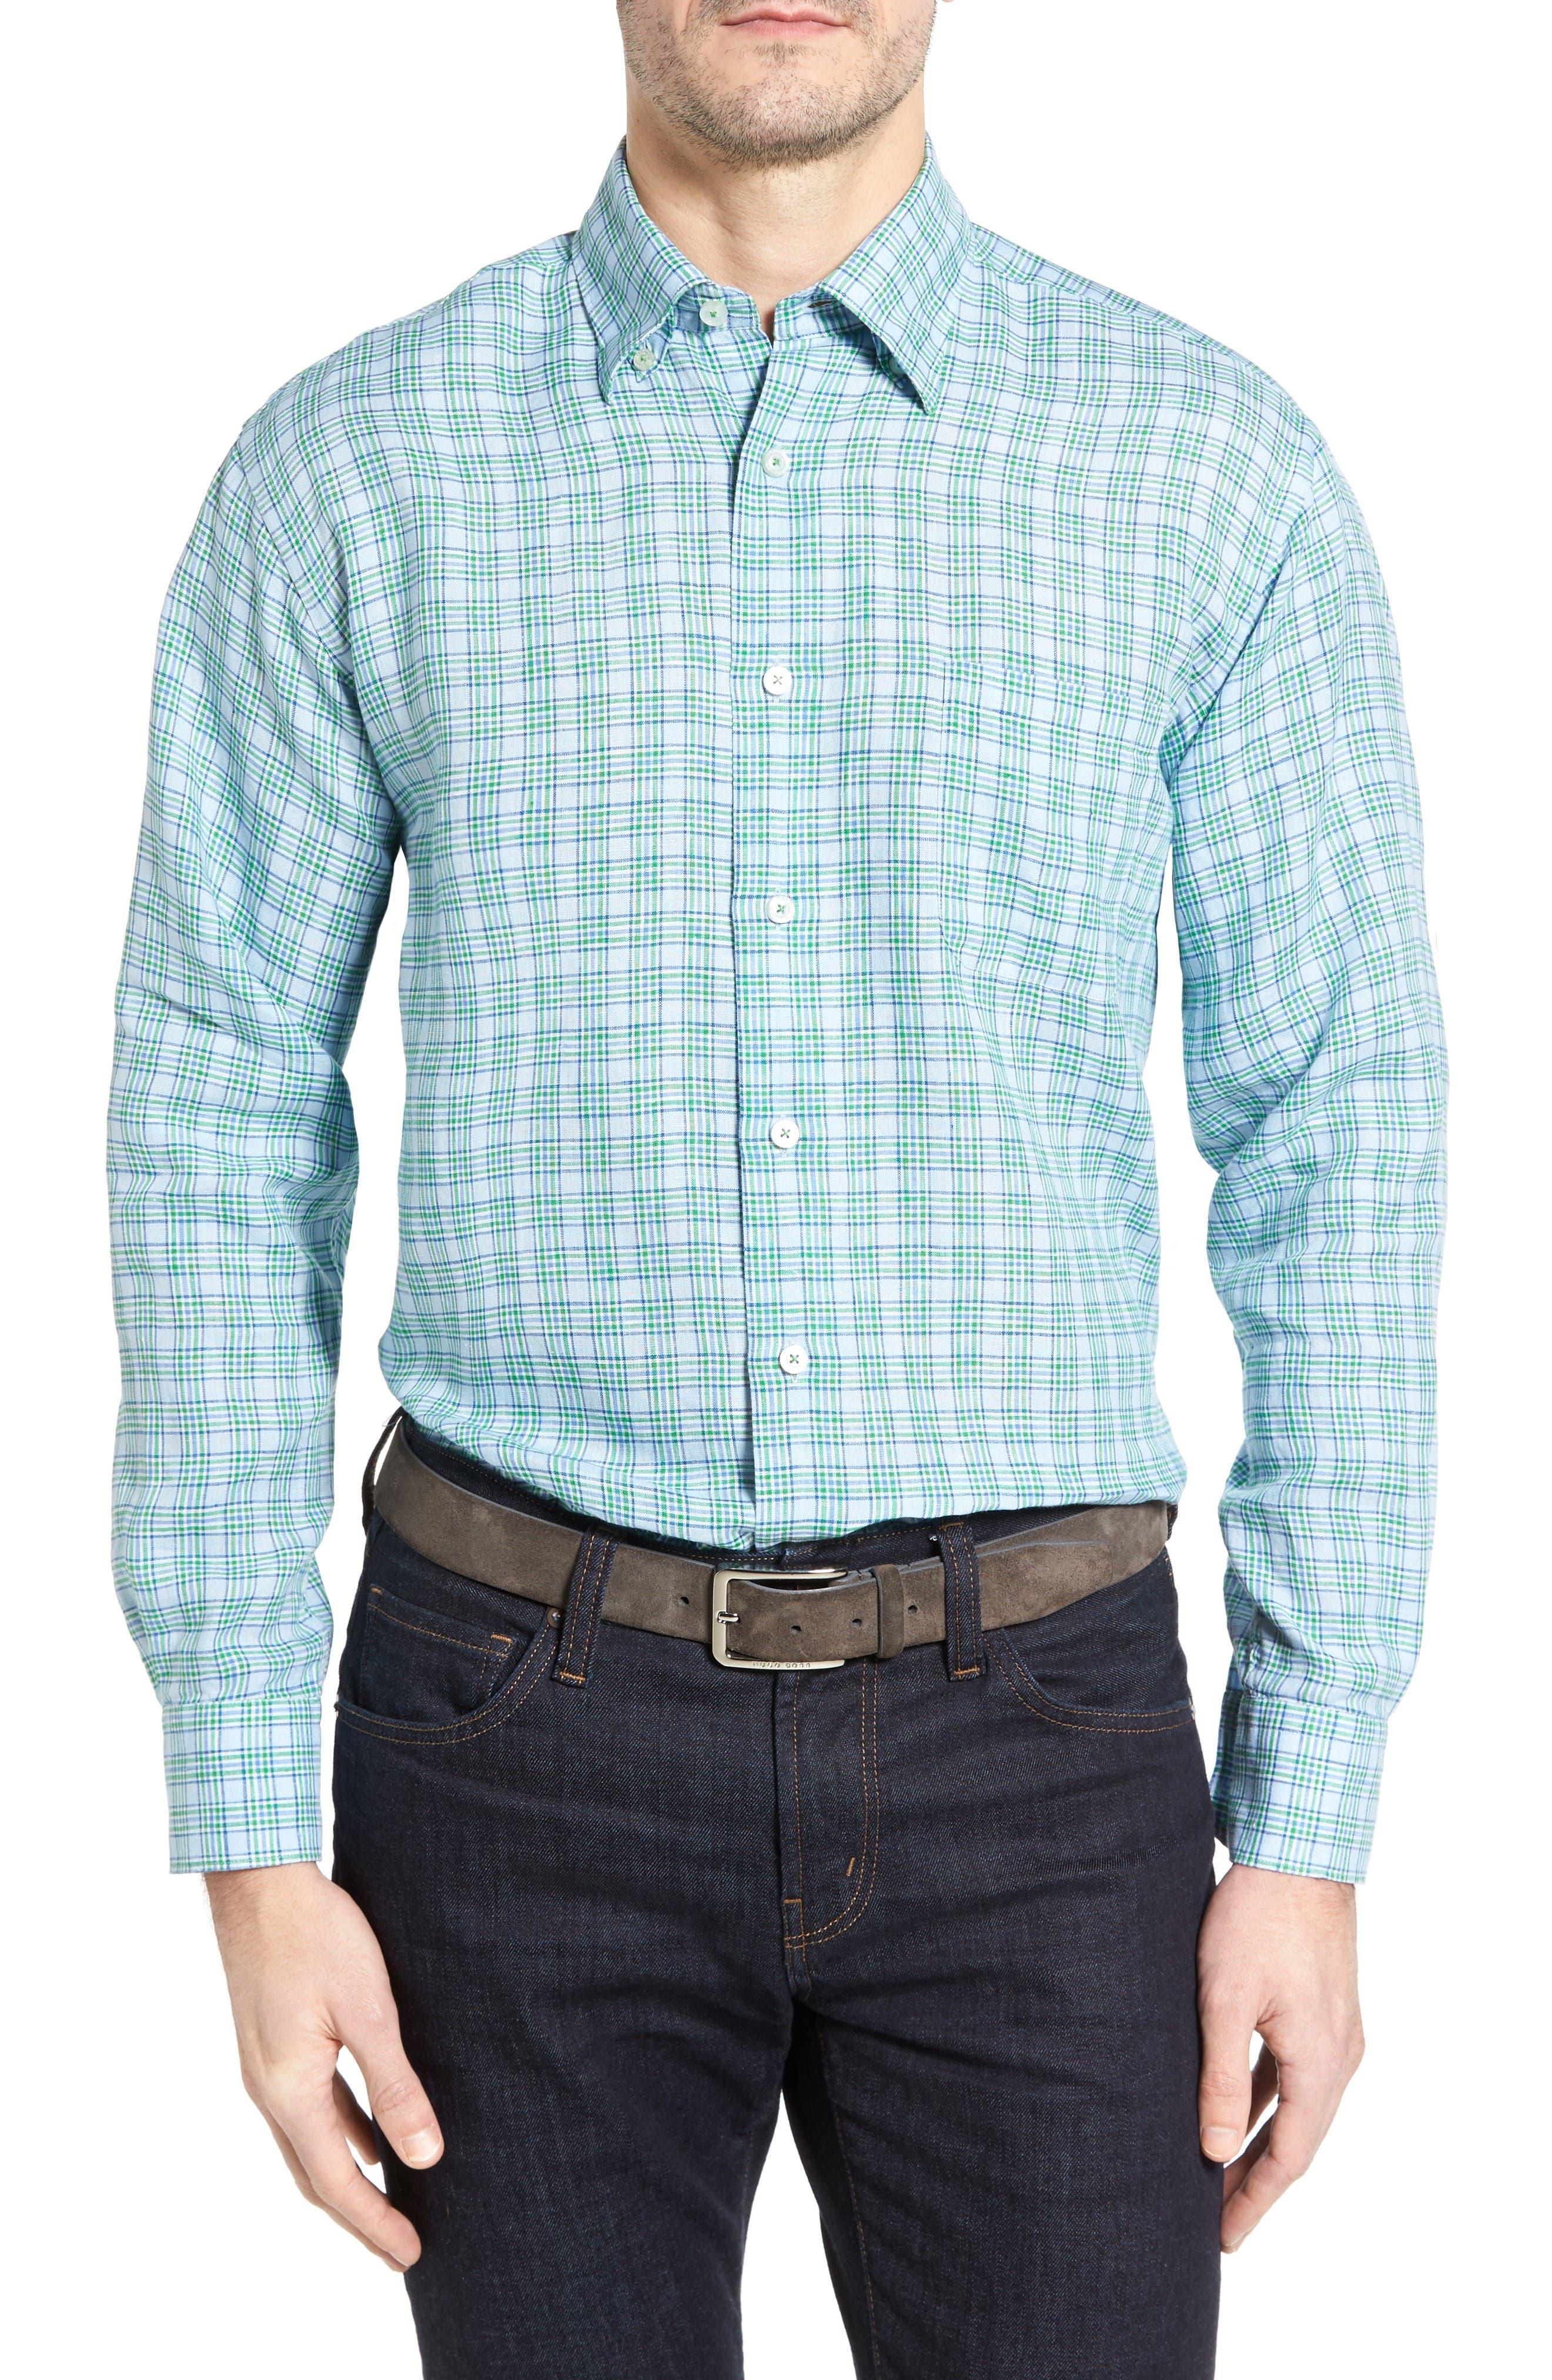 Alternate Image 1 Selected - Robert Talbott Anderson Classic Fit Sport Shirt